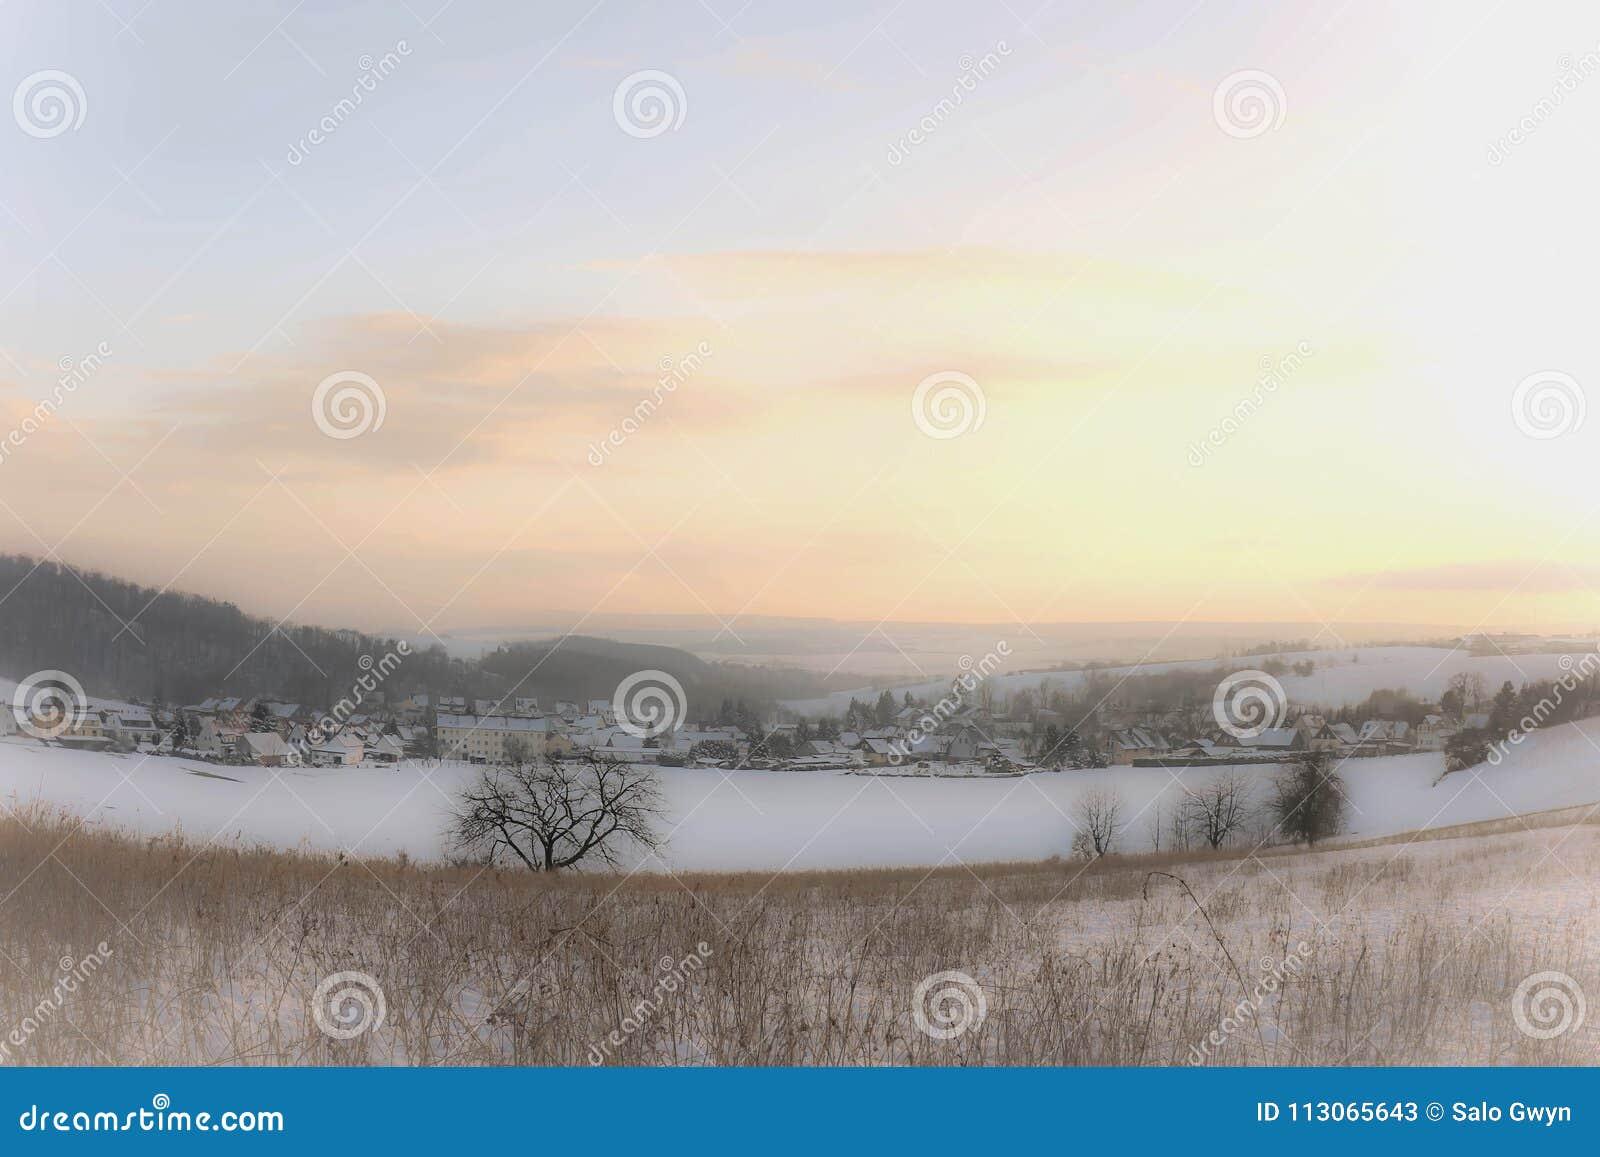 Proposta winterday no próximas de Nordhausen, mais baixas montanhas de Harz, Thuringia, Alemanha